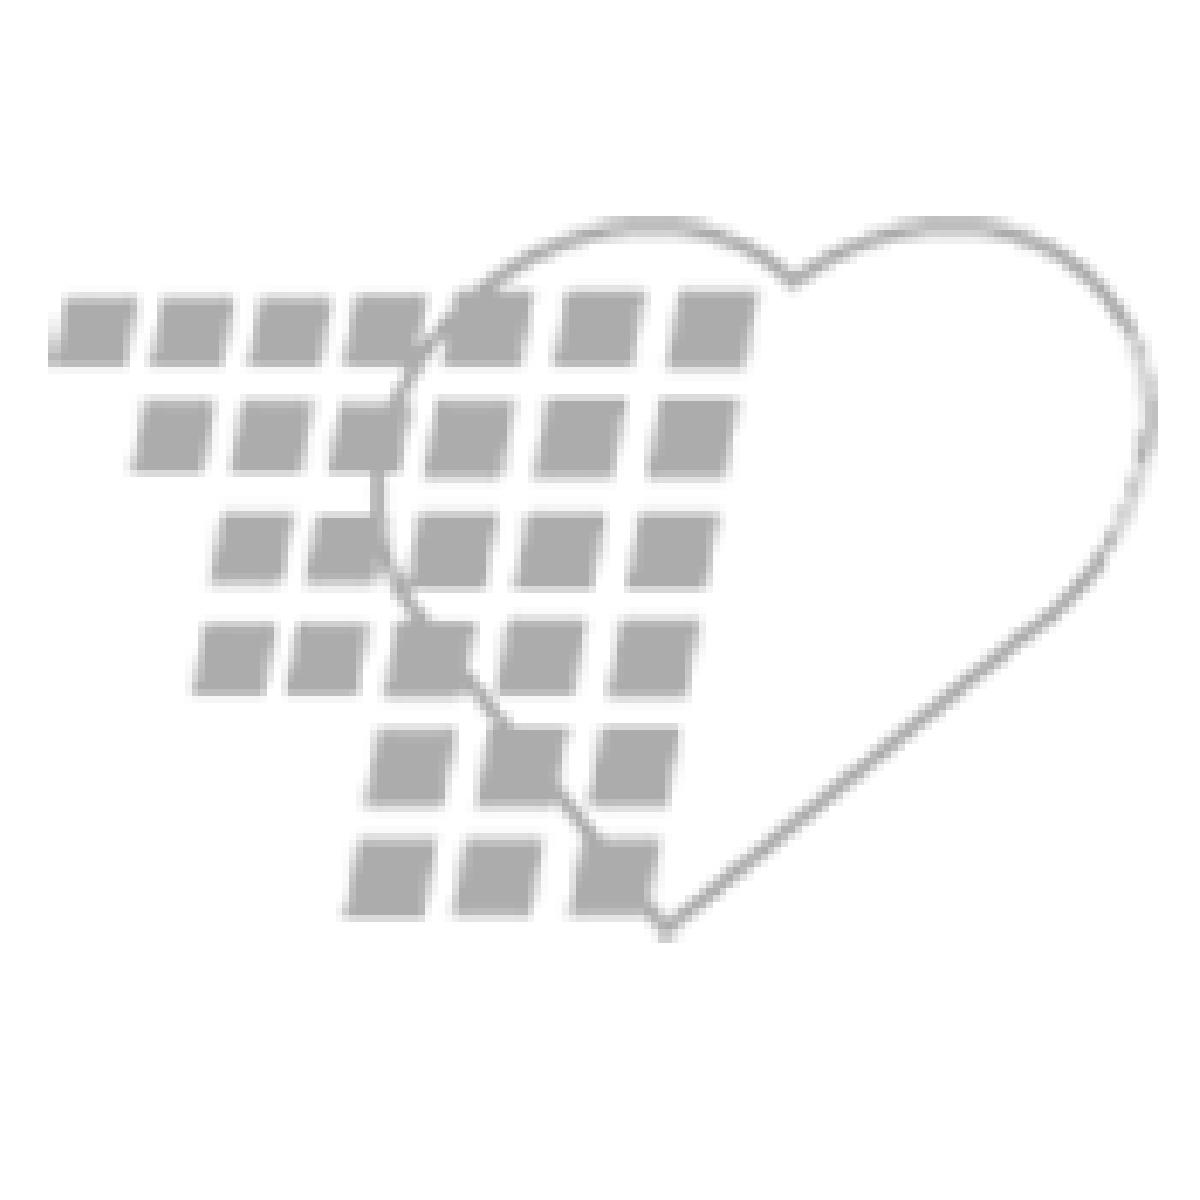 09-31-9965 Gastroesophageal Disorders Chart